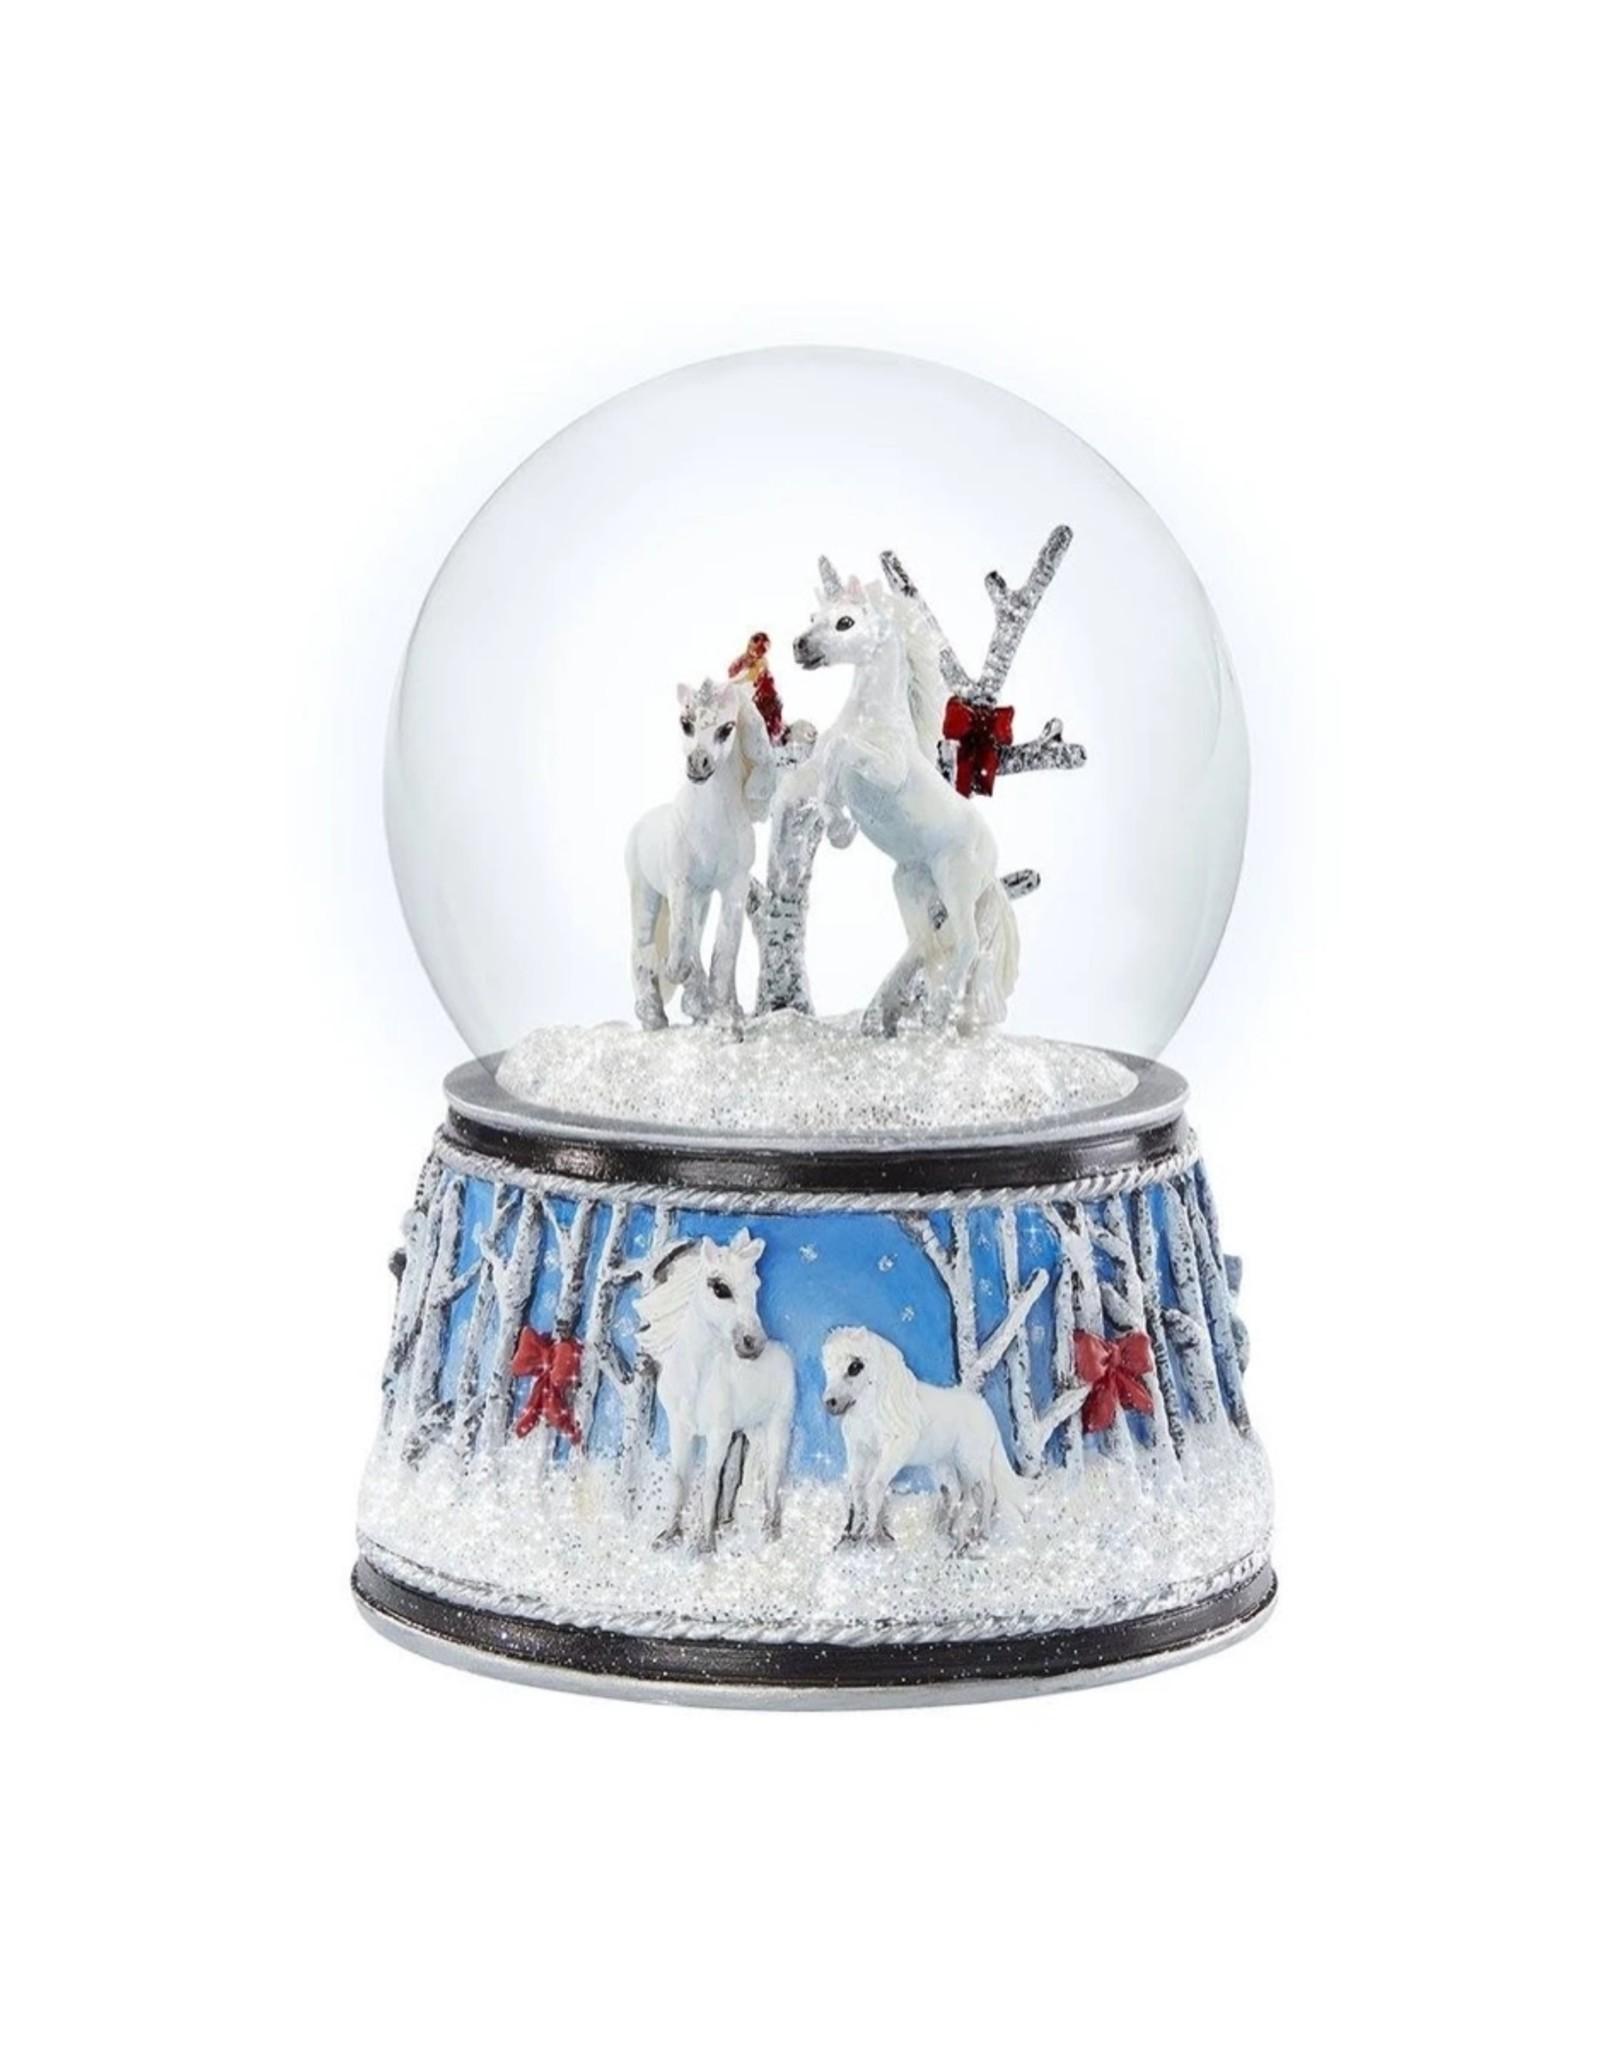 Breyer Enchanted Forest Musical Snow Globe